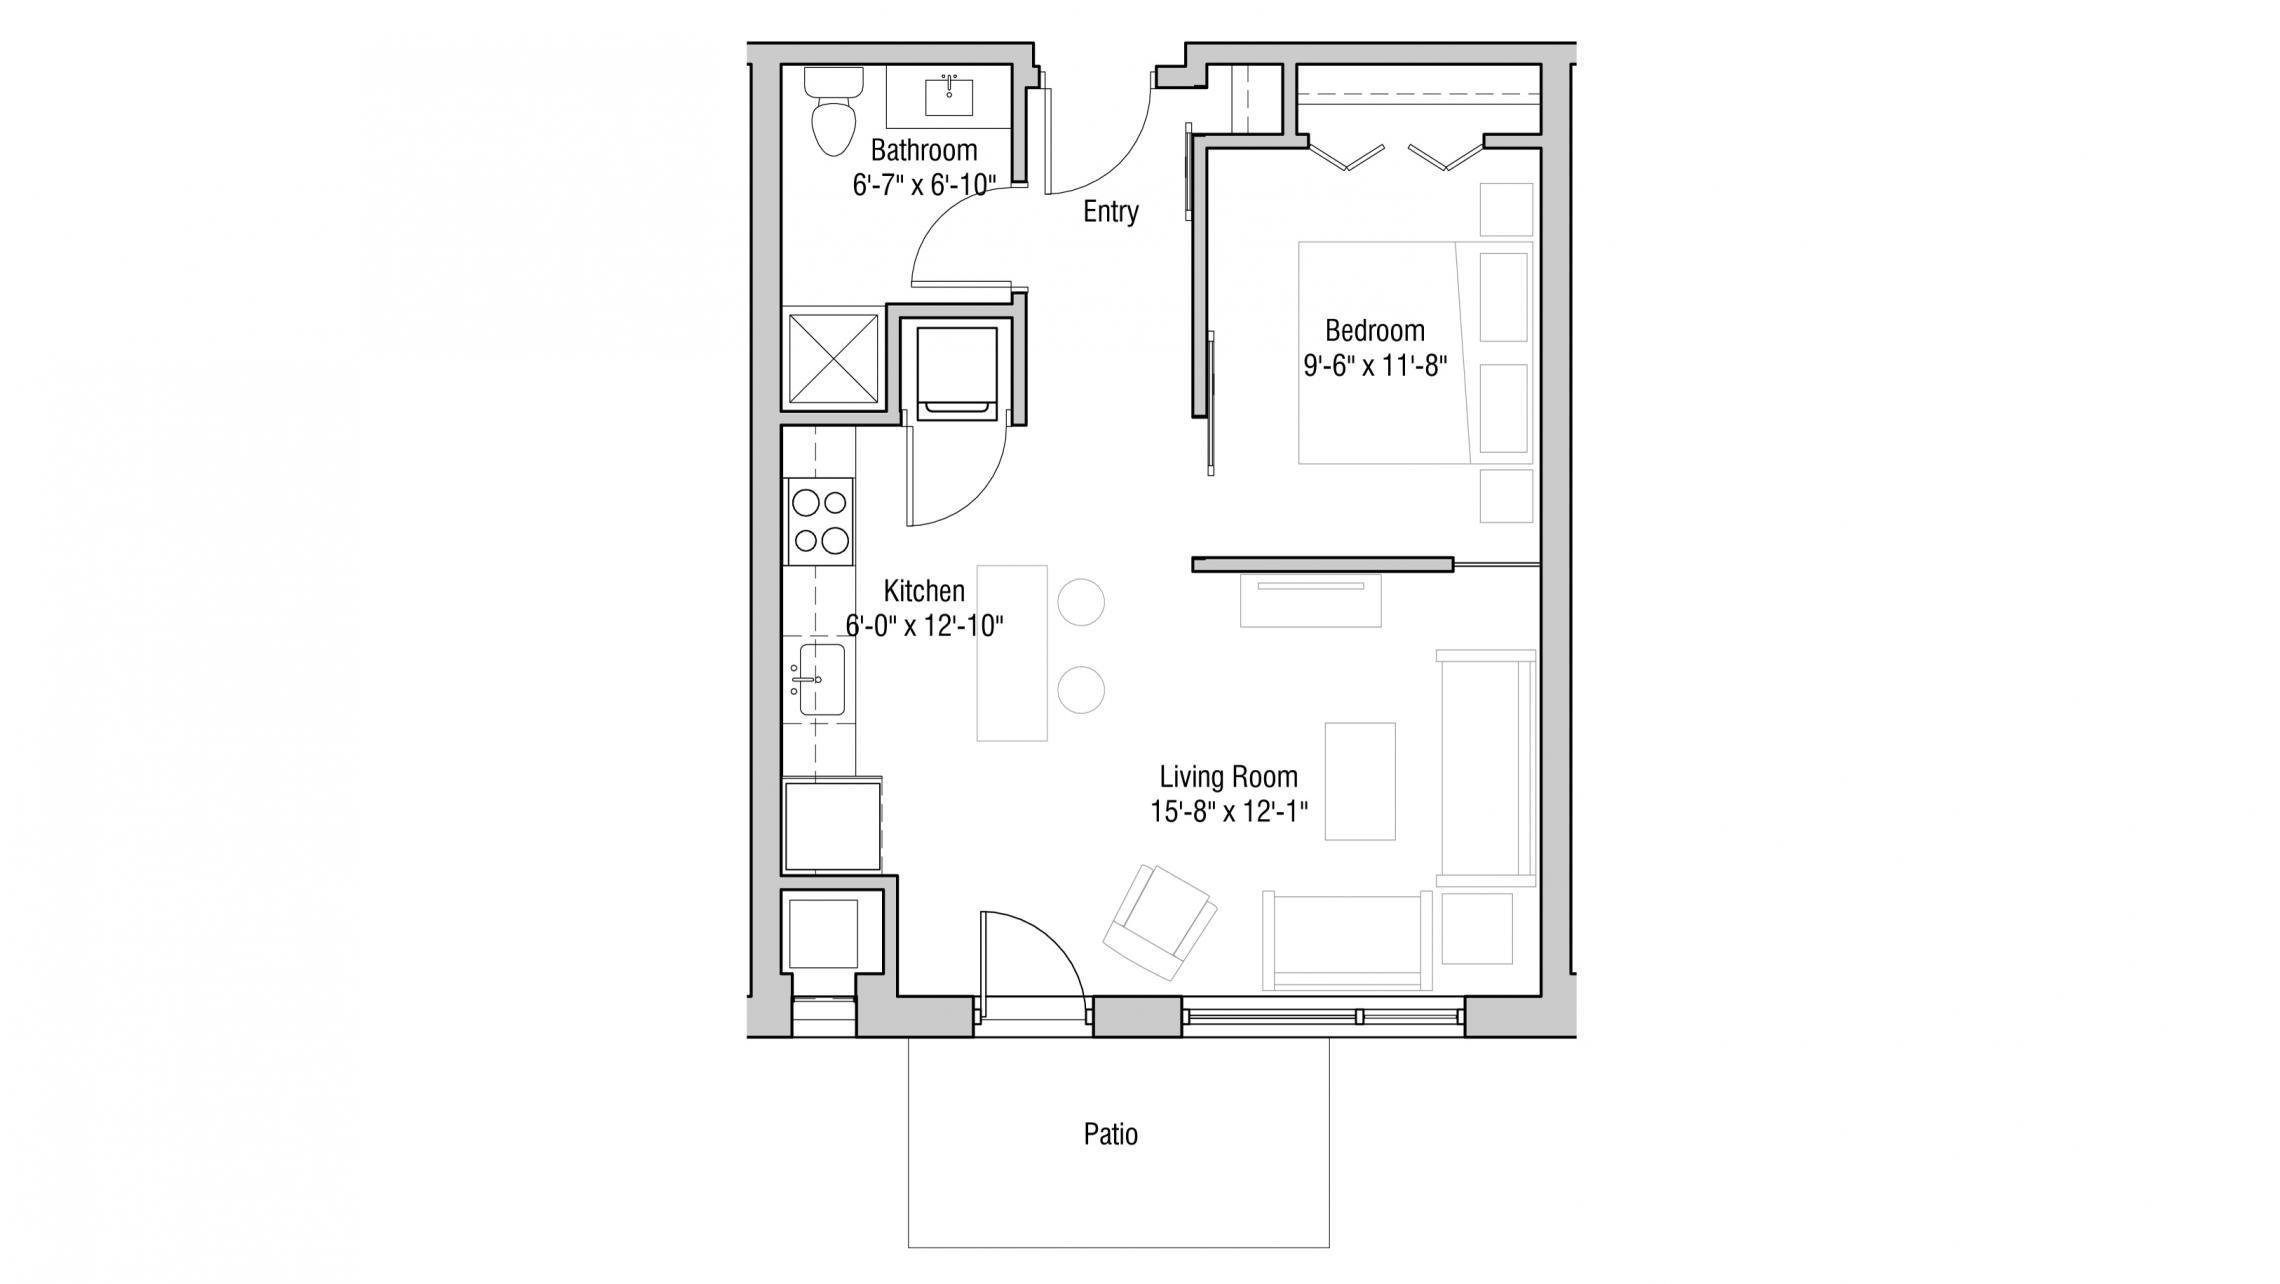 ULI Quarter Row 105 - One Bedroom, One Bathroom